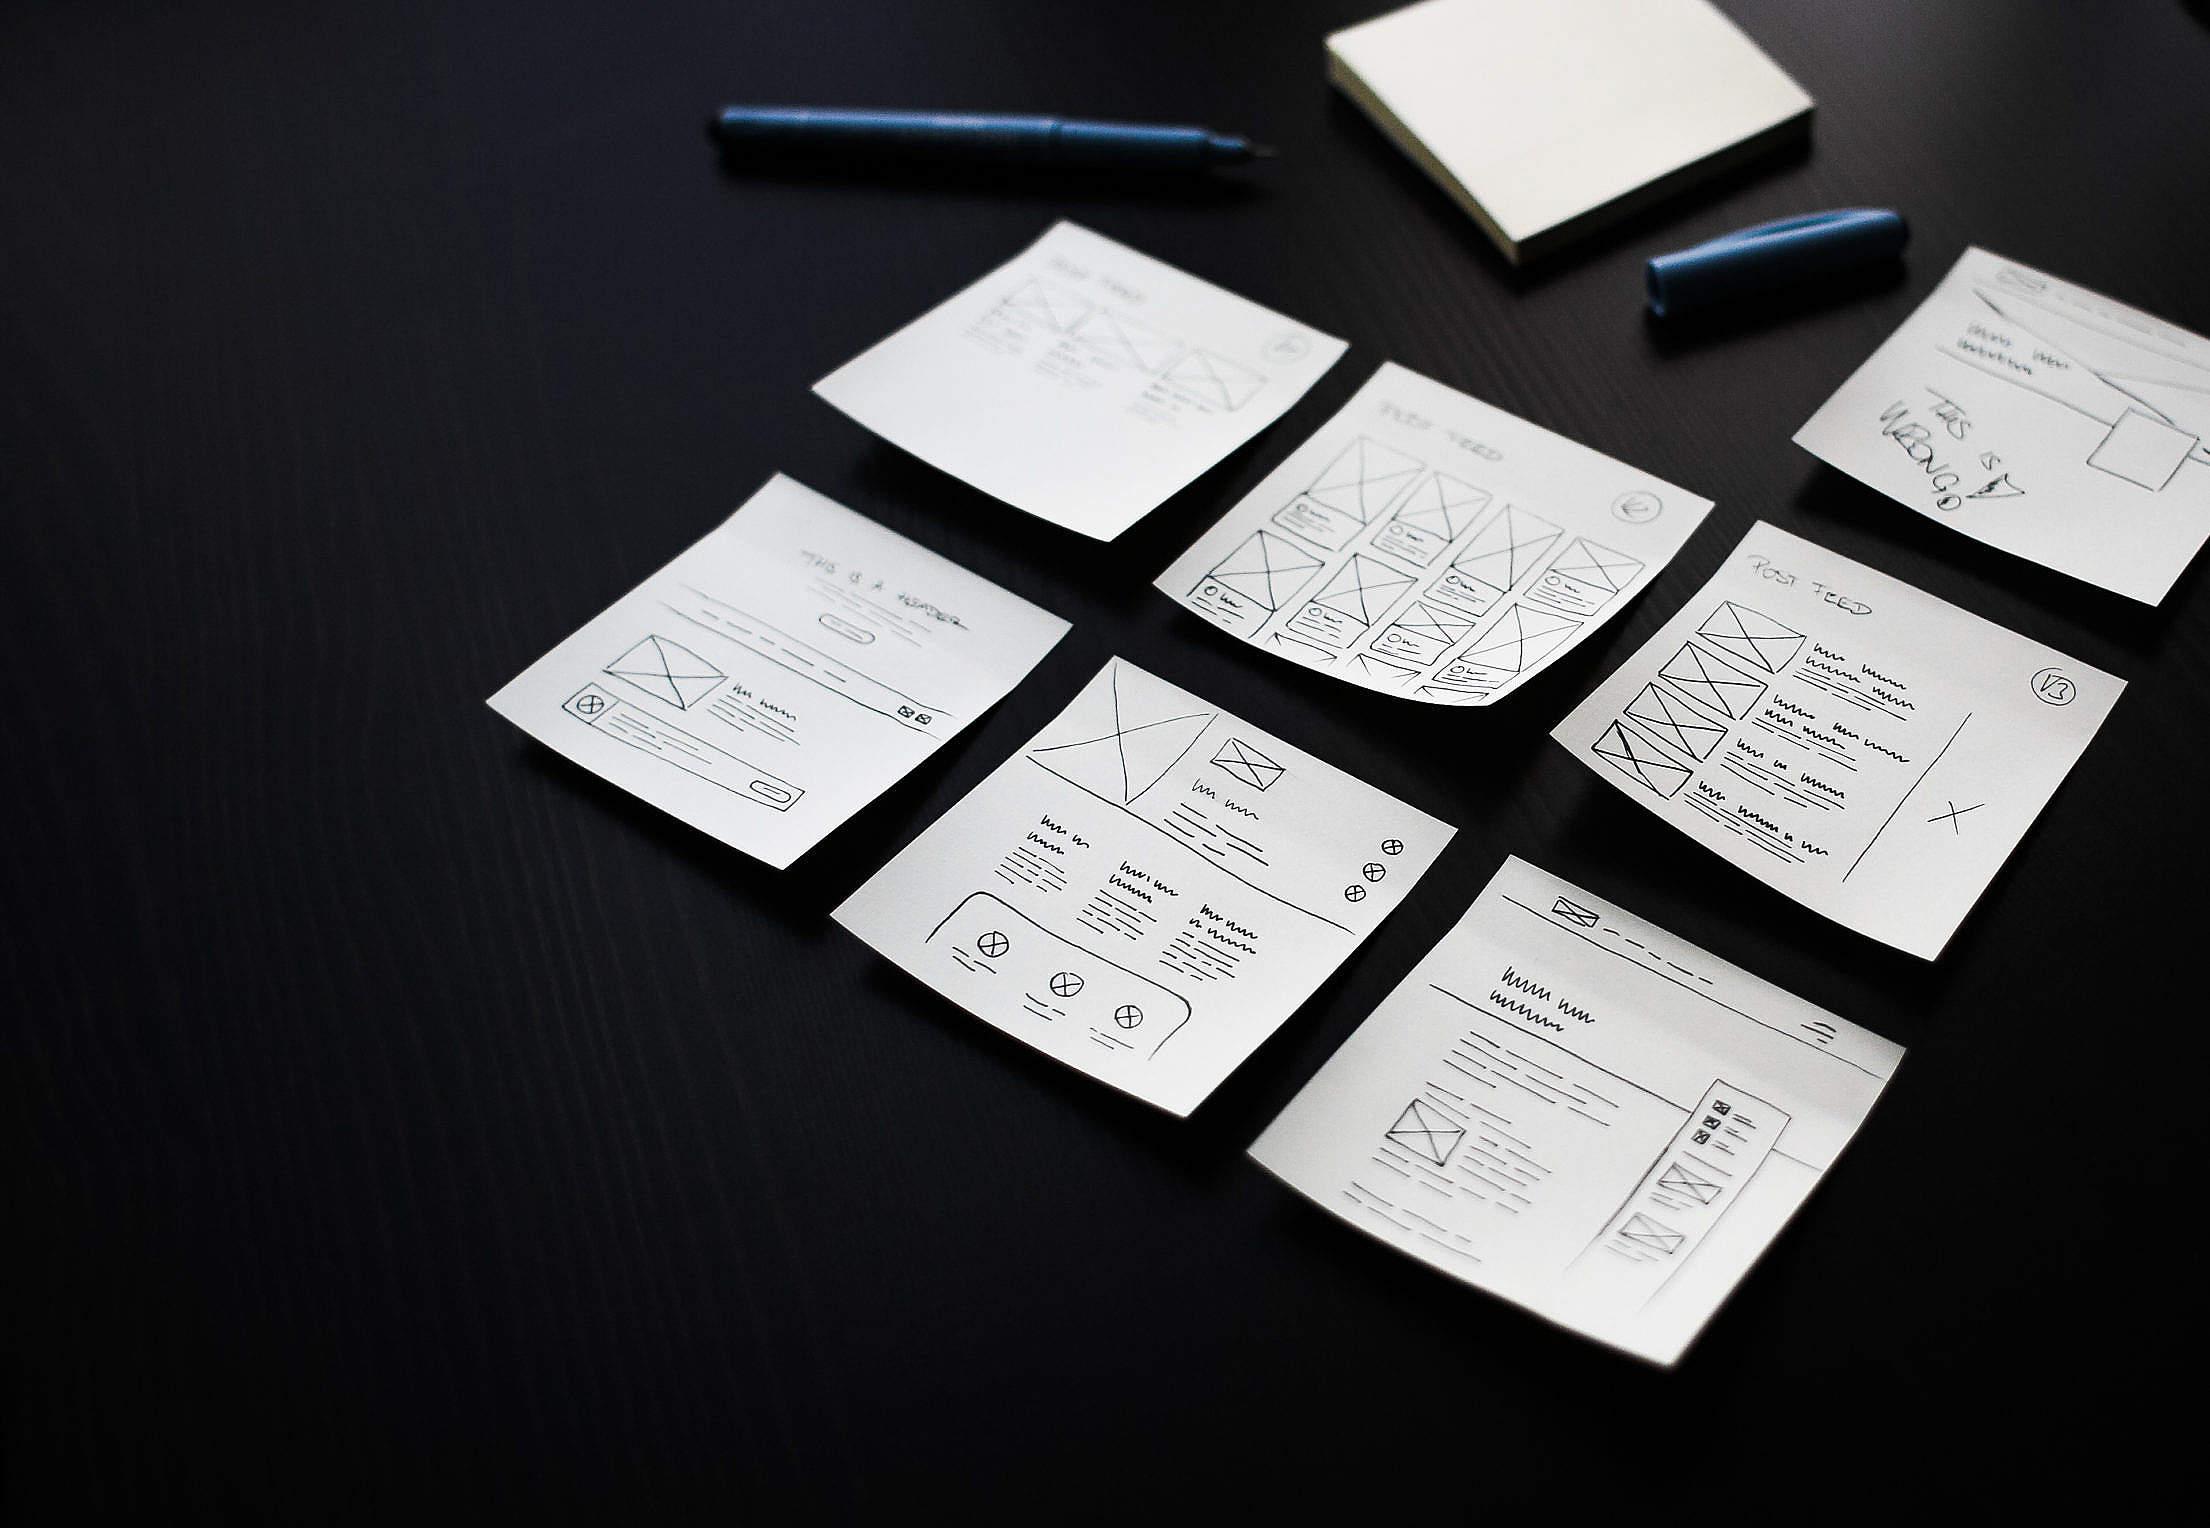 Webdesigner's Sticky Notes Free Stock Photo